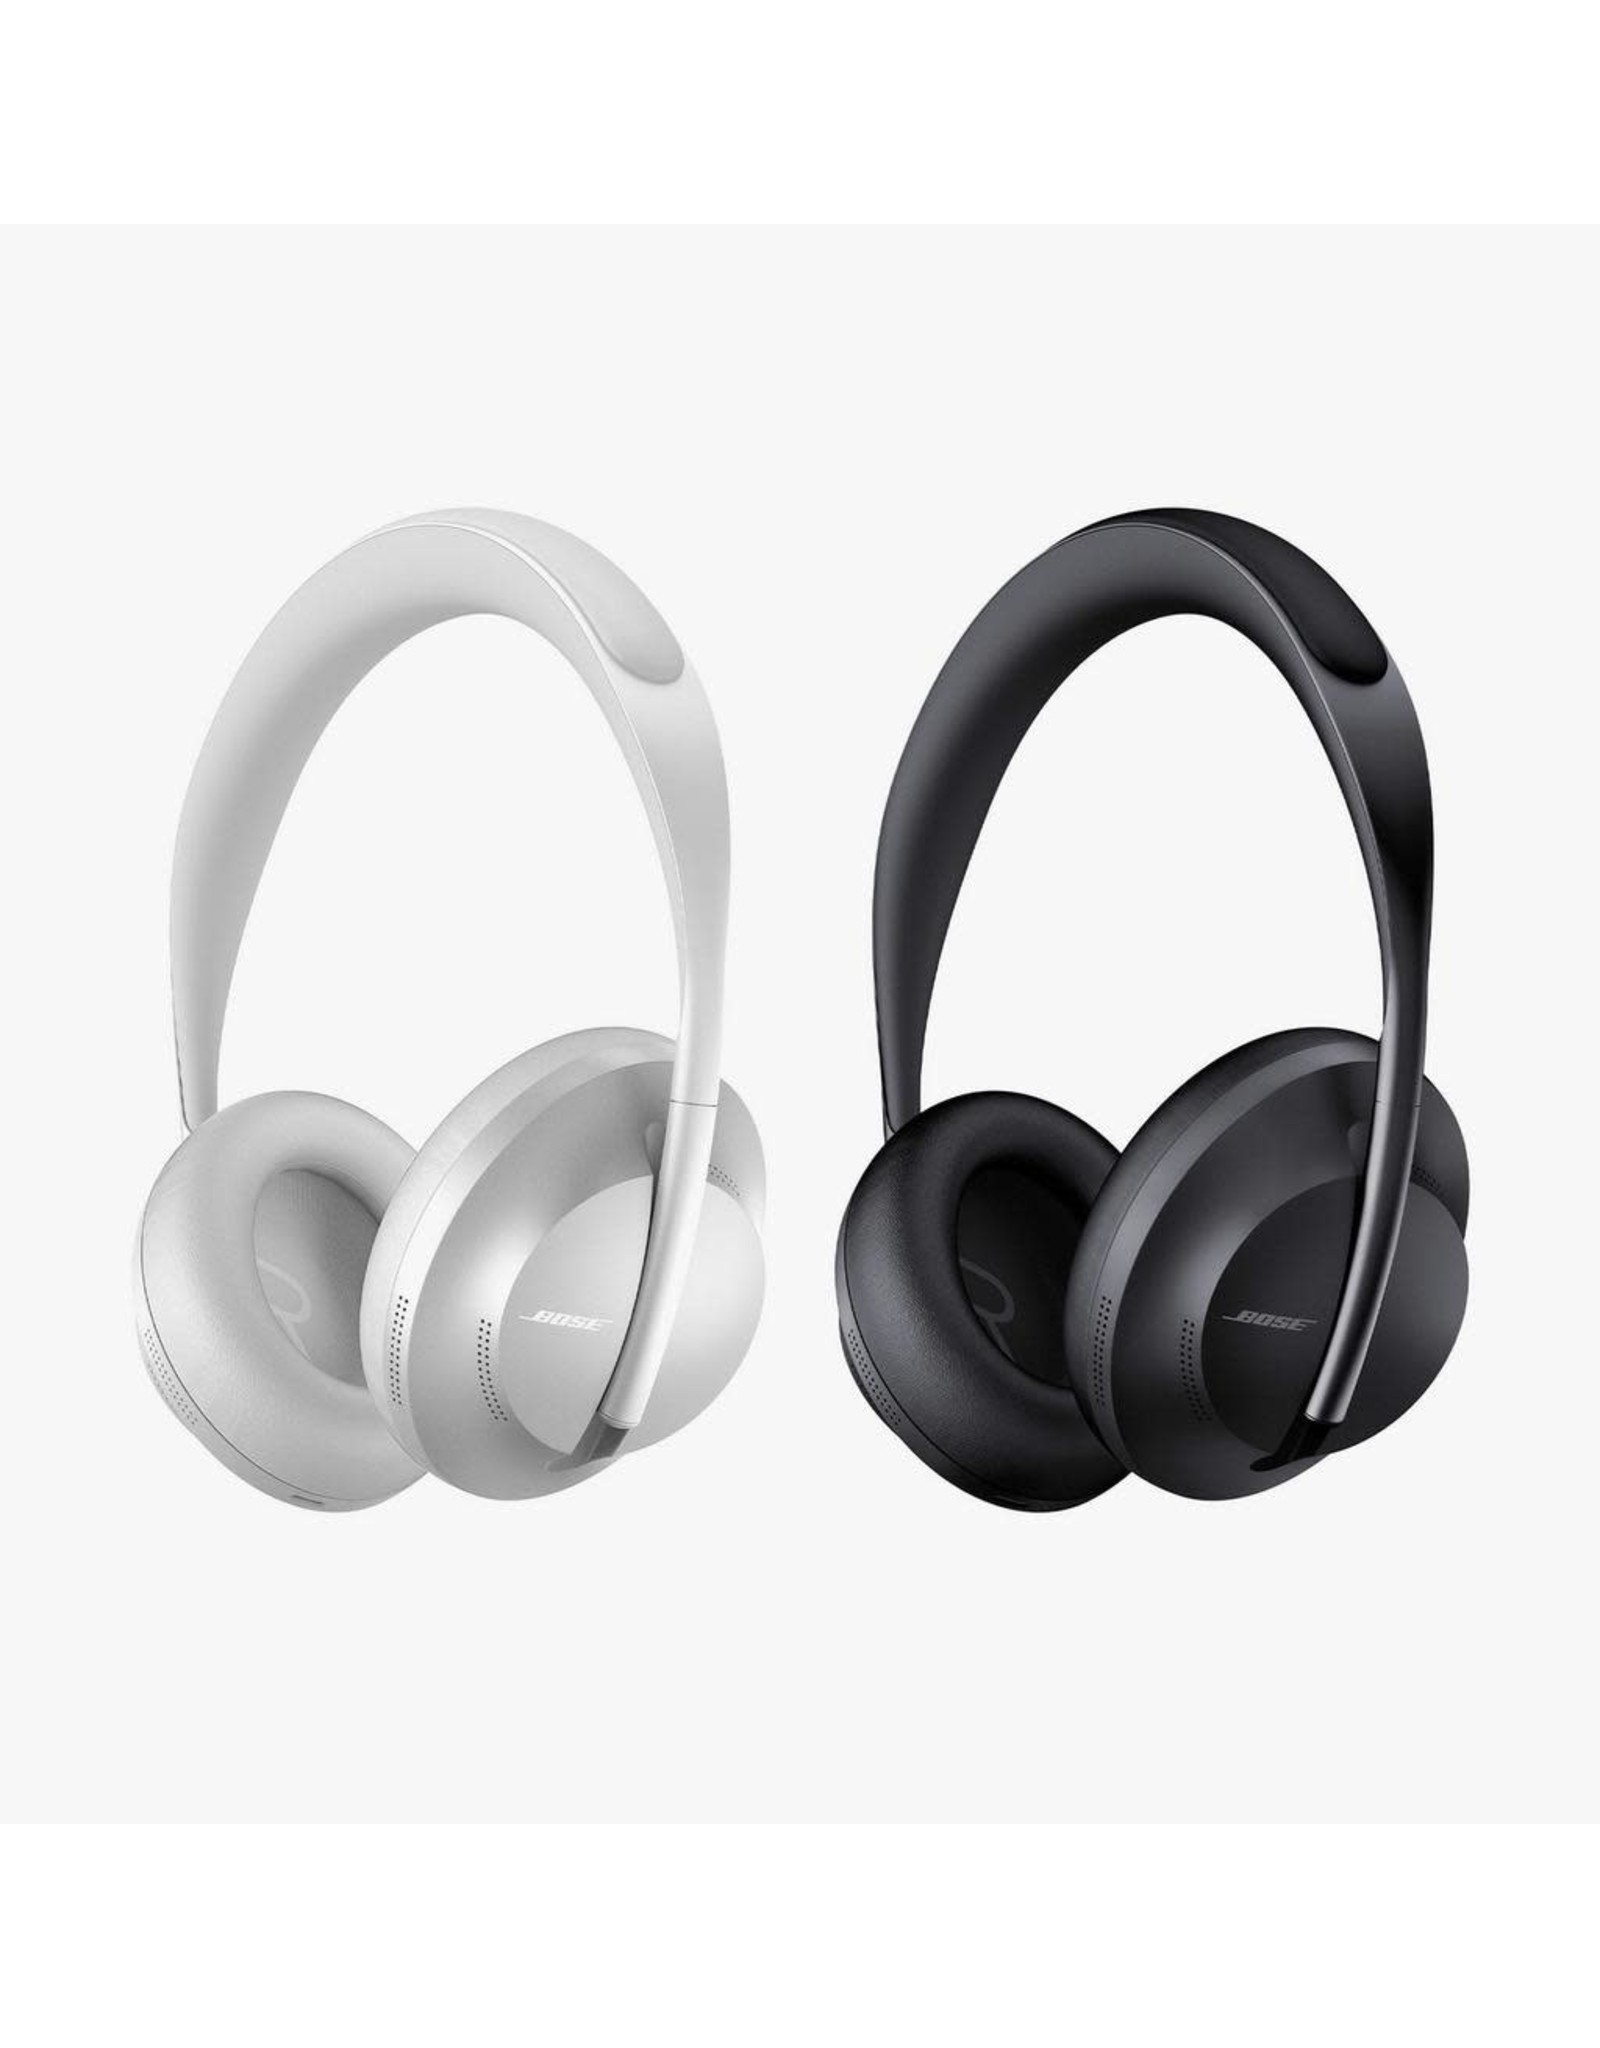 BOSE BOSE Headphones 700 Noise Cancelling Headphones